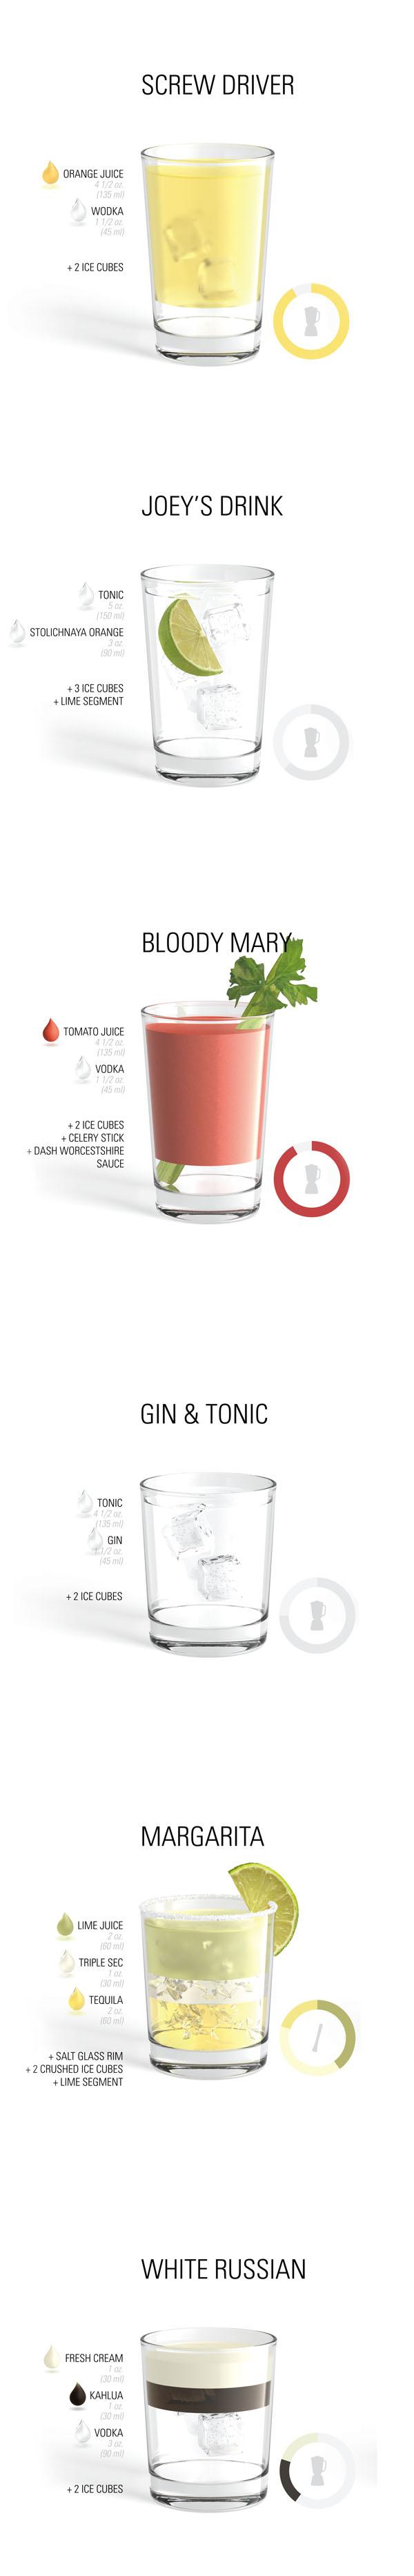 konstantin-datz-cocktail-poster-11